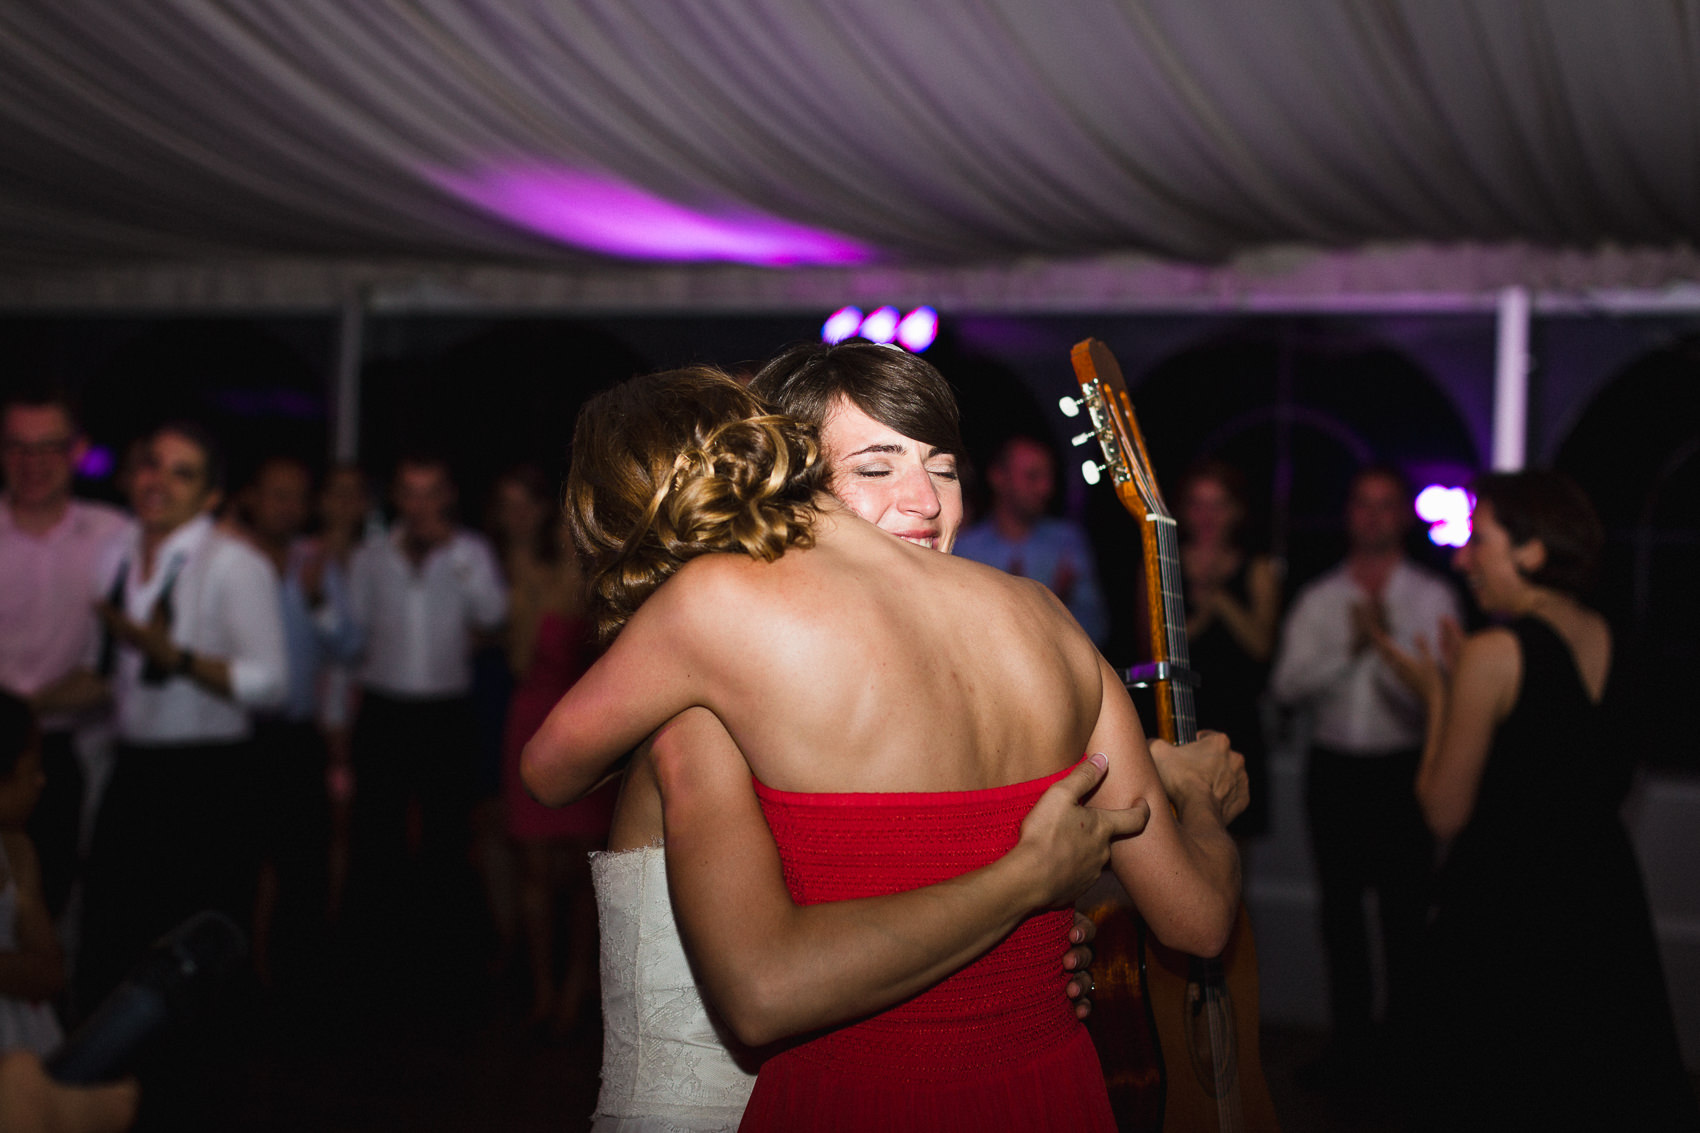 mariage-charlotte-et-joel-trendzphotography-130